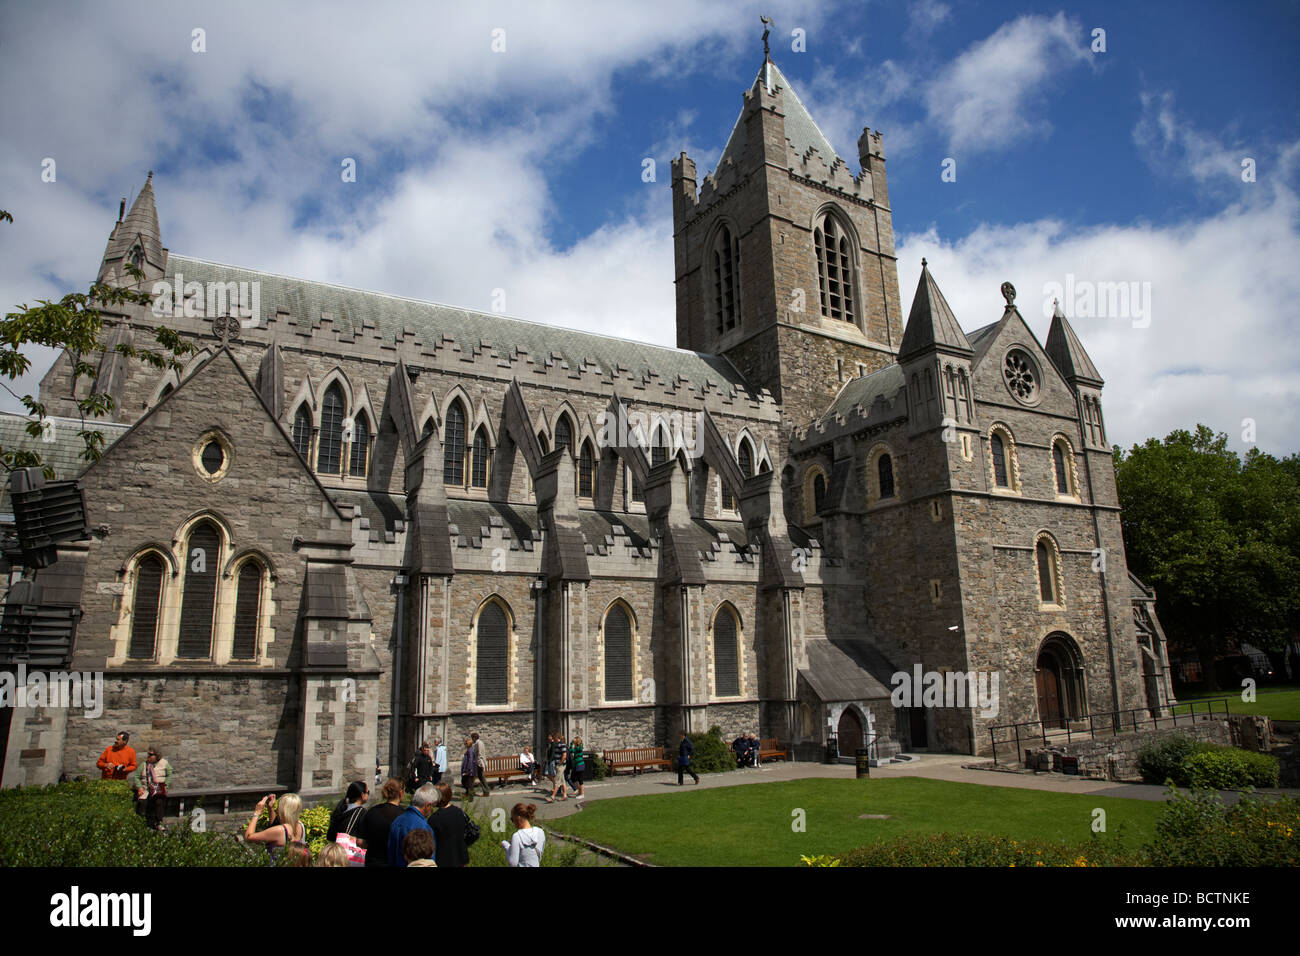 Christchurch Video Hd: Christ Church Kathedrale Kathedrale Der Heiligen